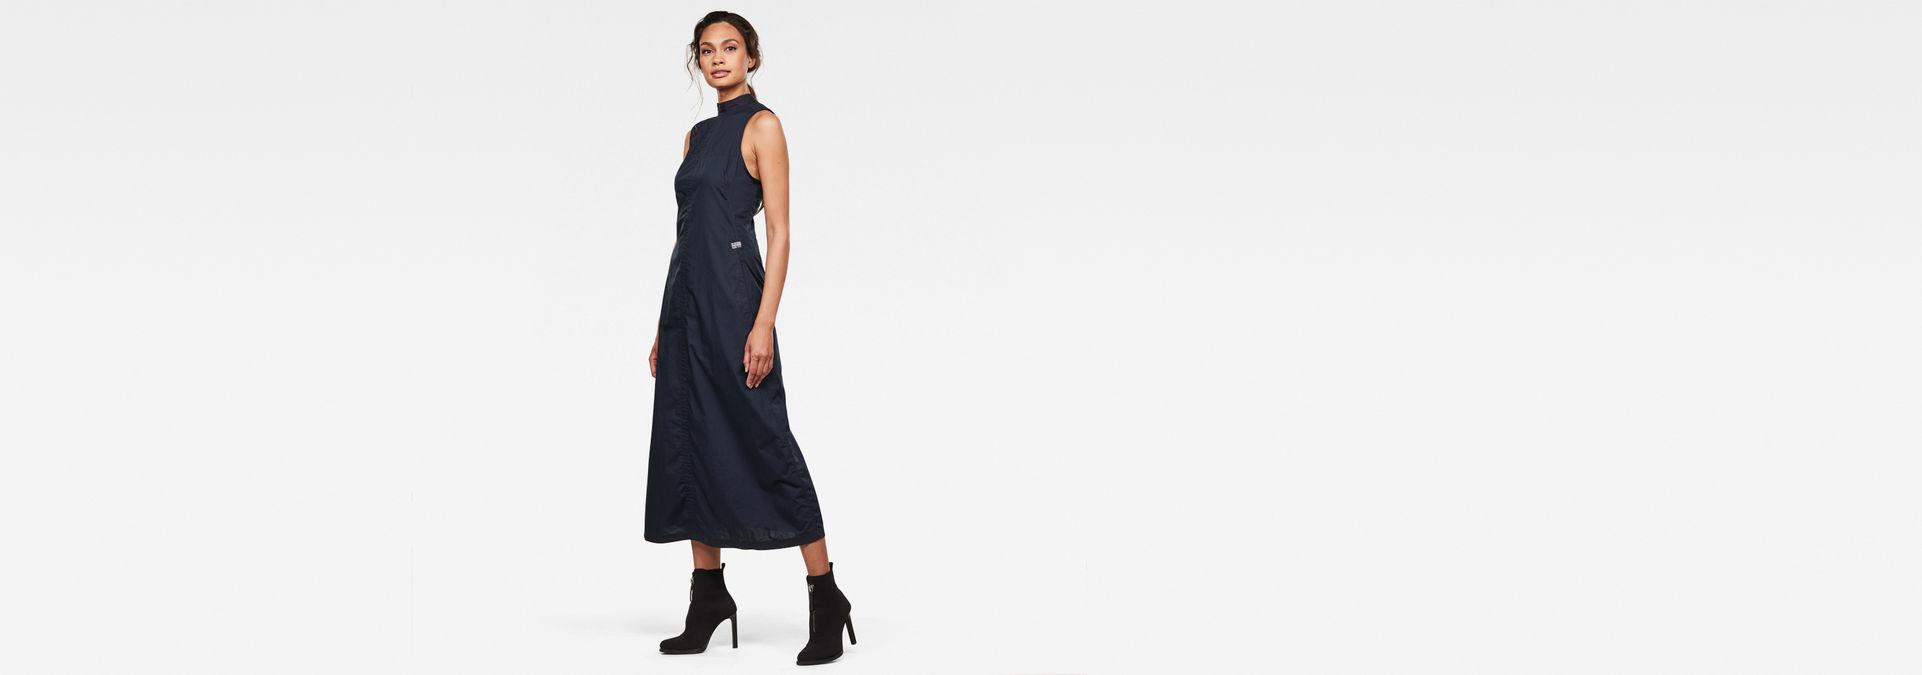 Utility Long Kleid  Mazarine Blue  Gstar Raw®